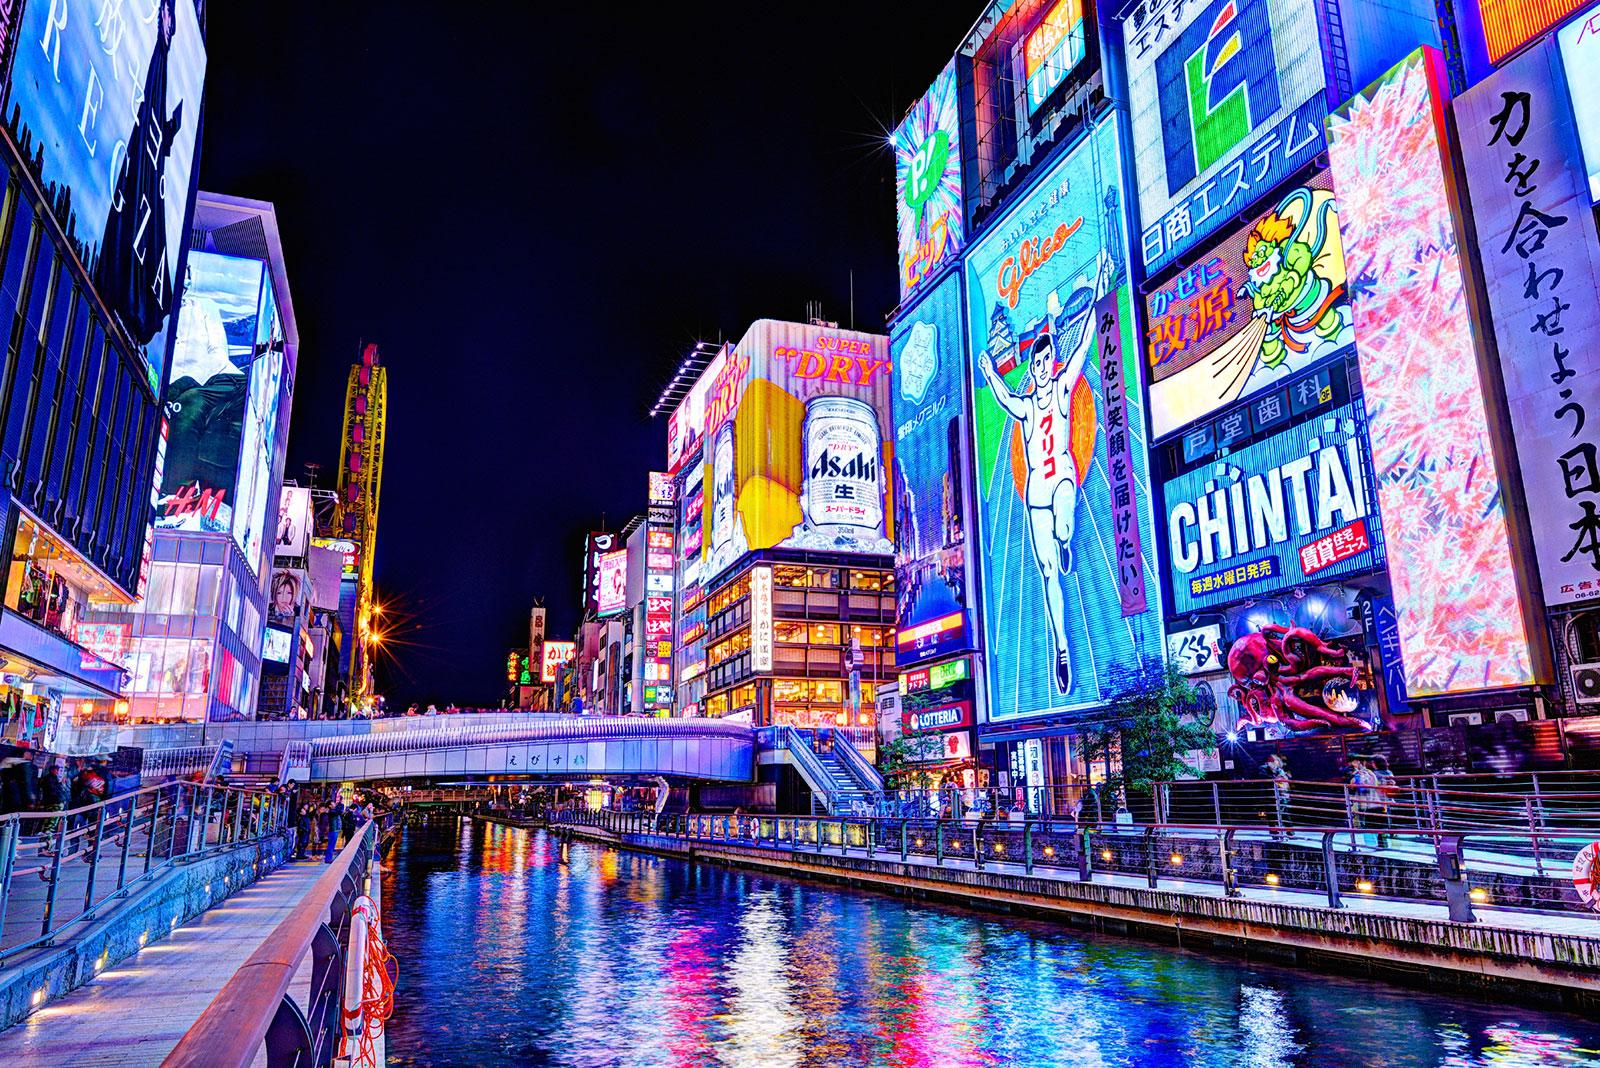 The Neon Lights of Dotonbori Geisha